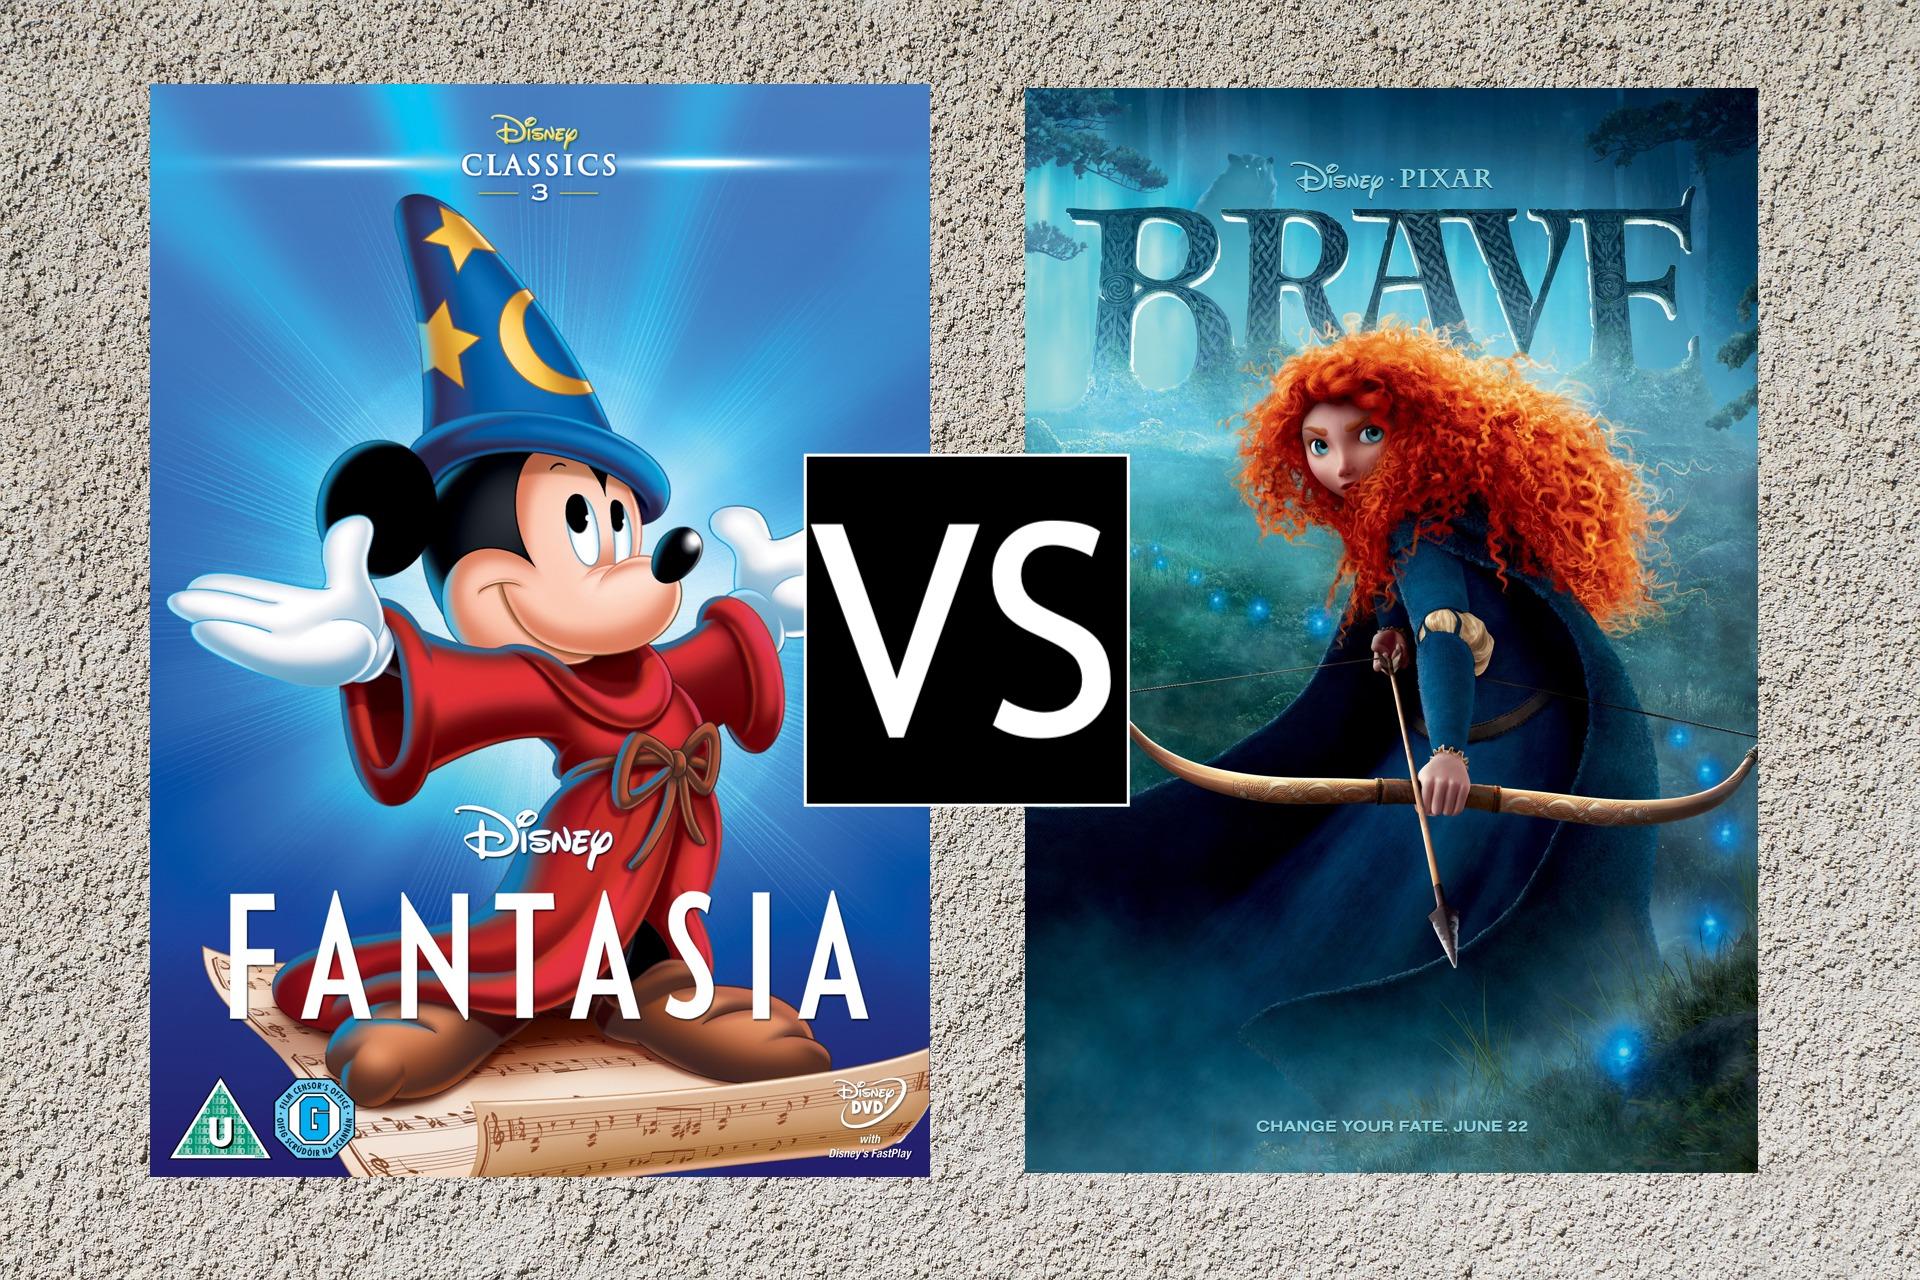 14 Disney Tournament Fantasia Vs Brave 3 The Fury Begins